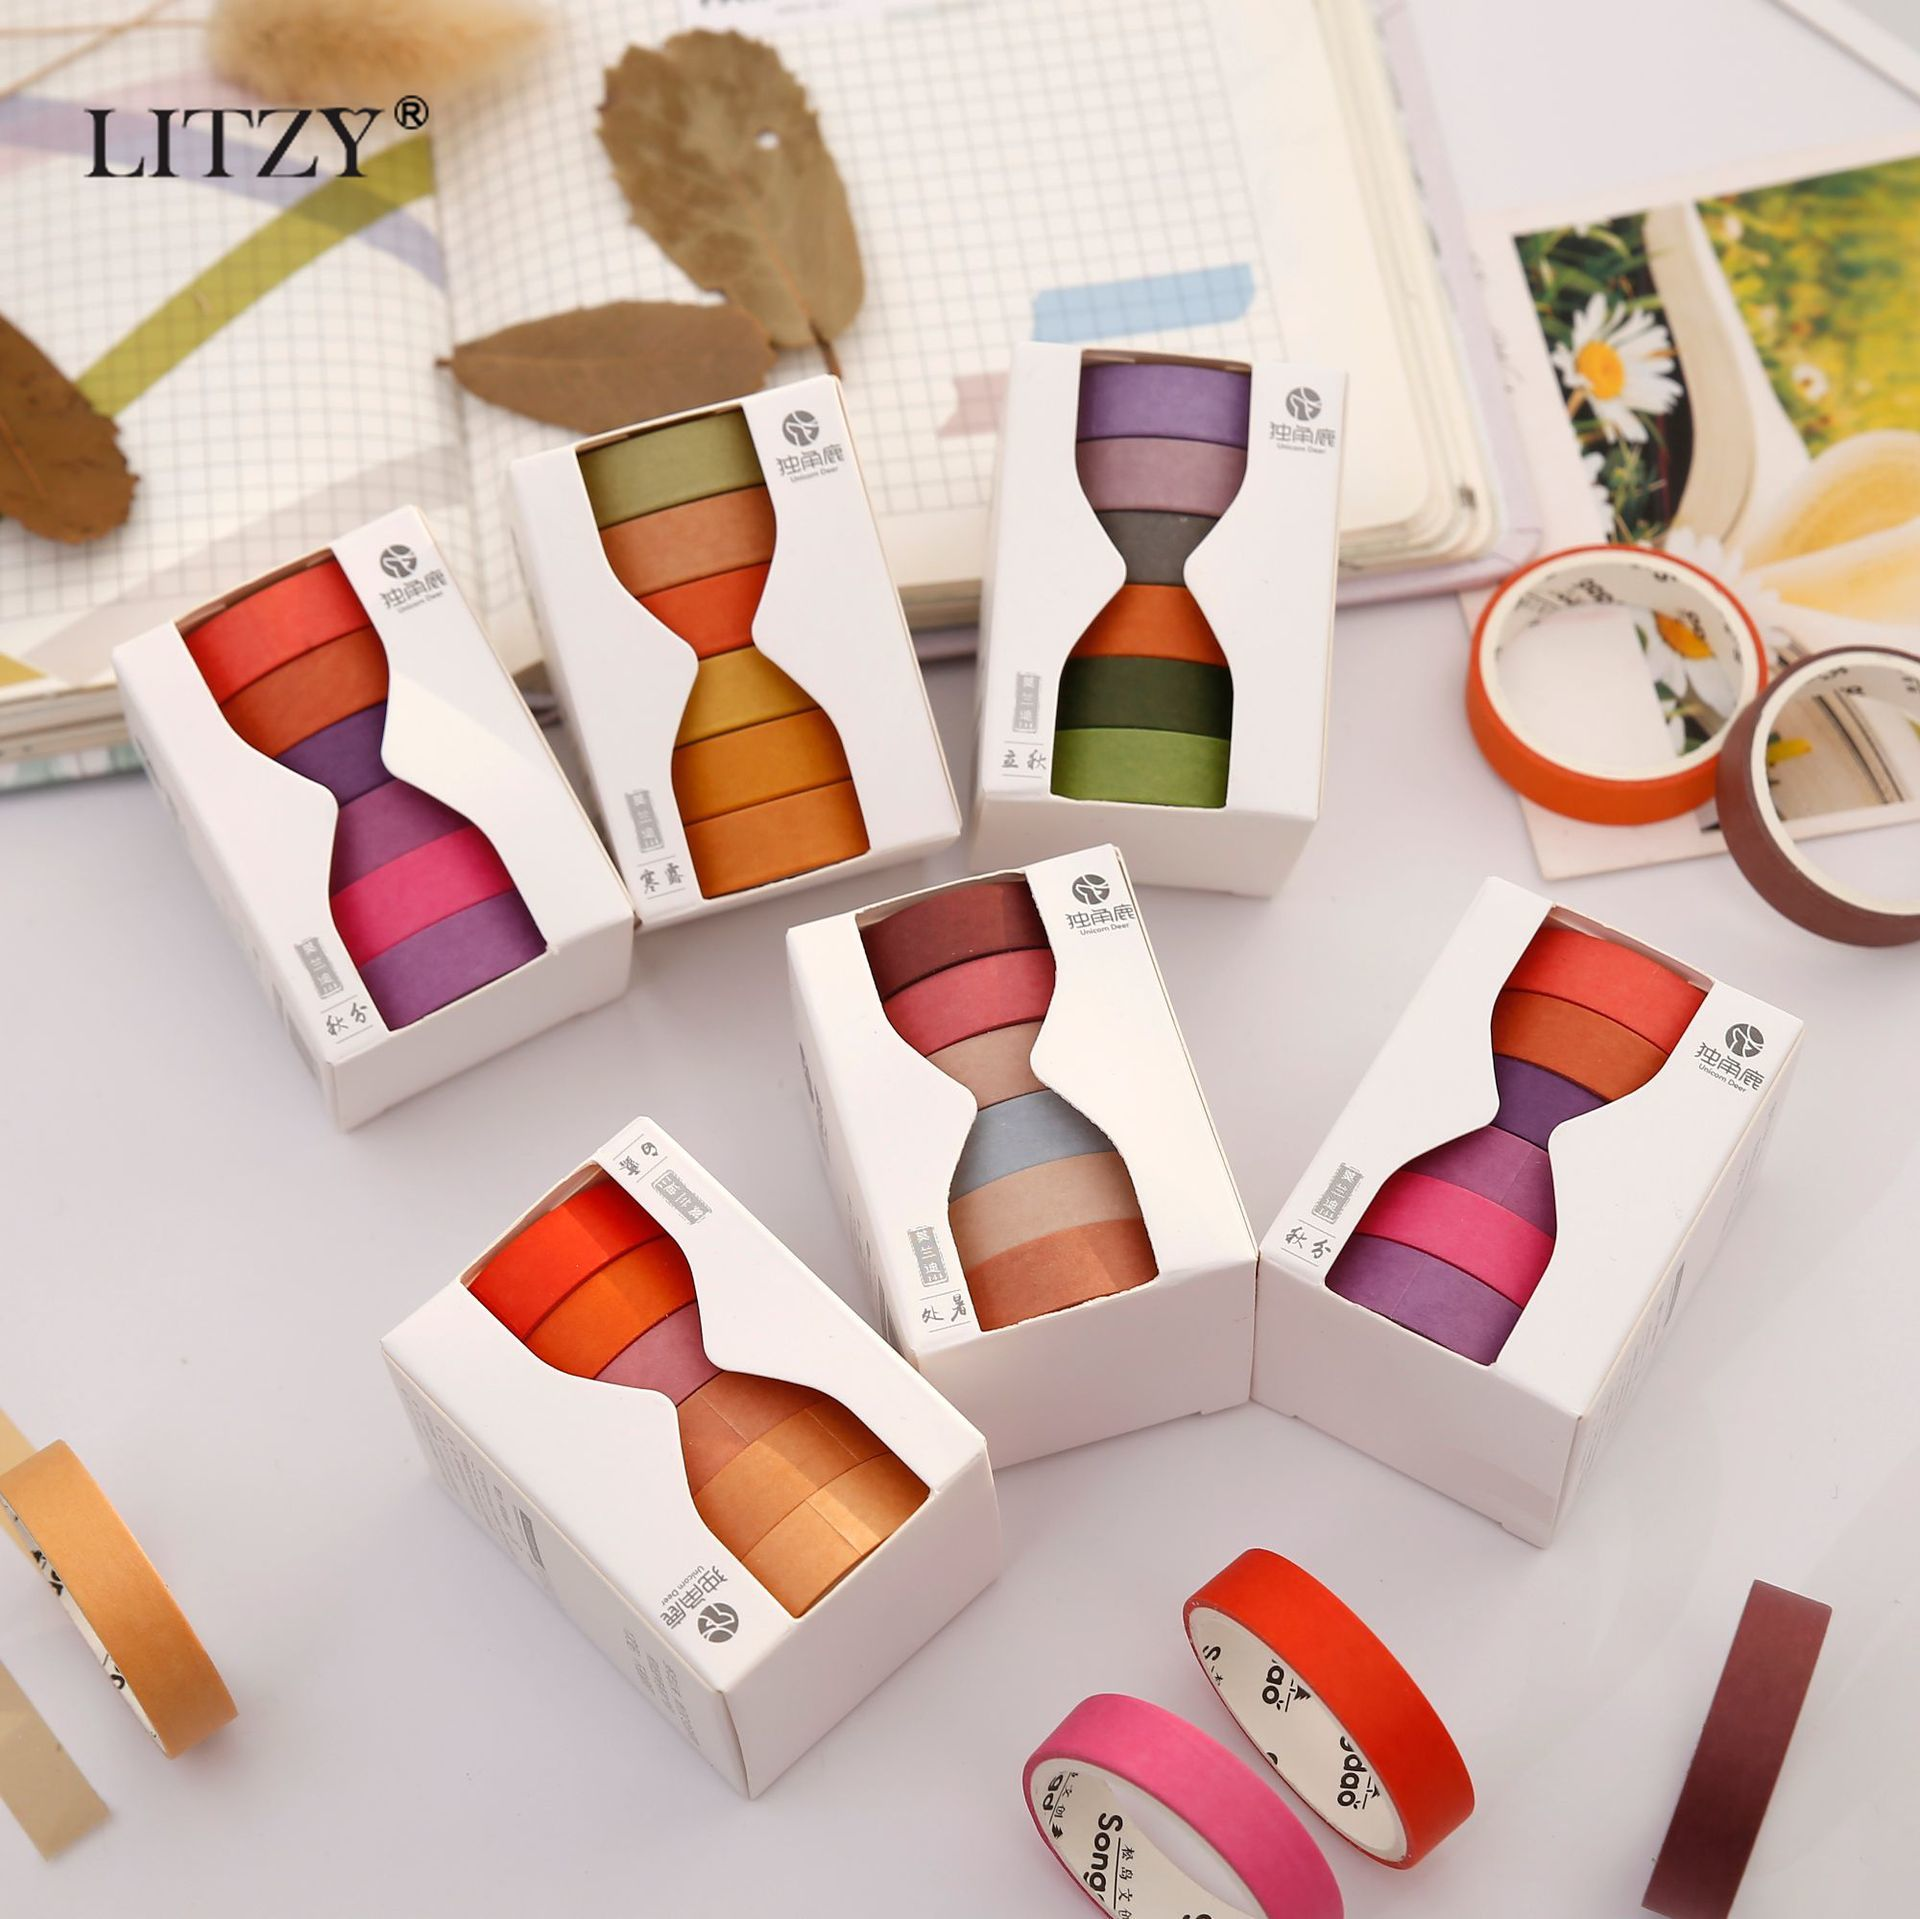 6 Pcs/lot Solar Terms Pure Color Journal Washi Tape Set DIY Scrapbooking Sticker Label Masking Tape School Office Supplies